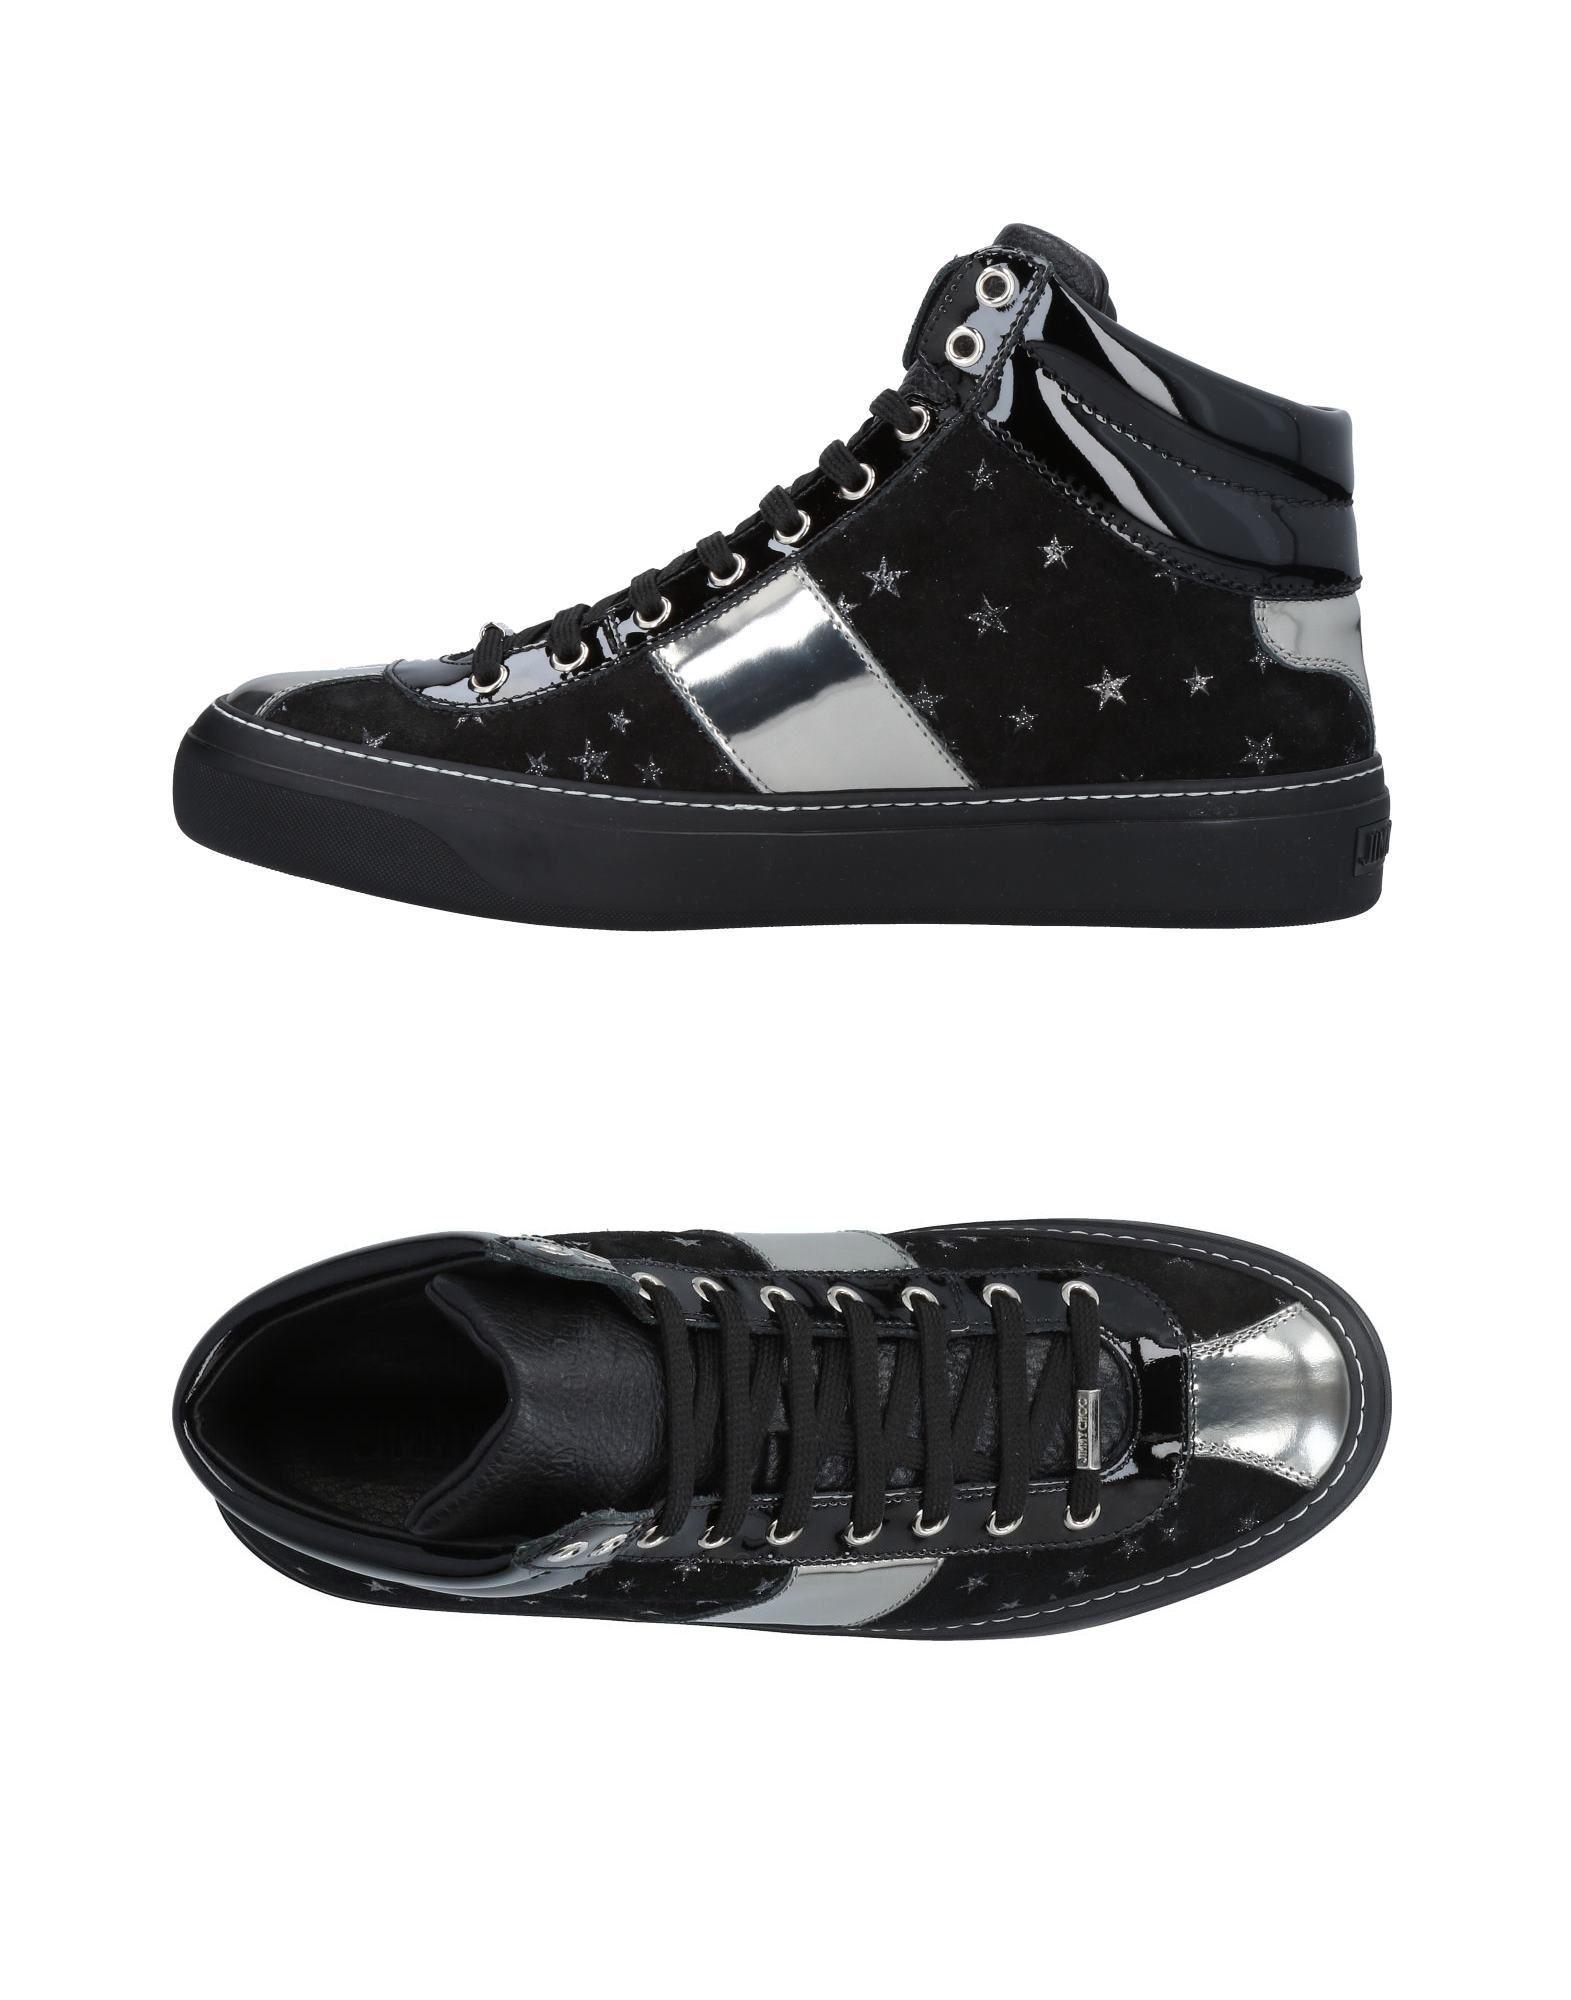 Jimmy Choo Sneakers Herren  Schuhe 11481134AS Gute Qualität beliebte Schuhe  63acc1